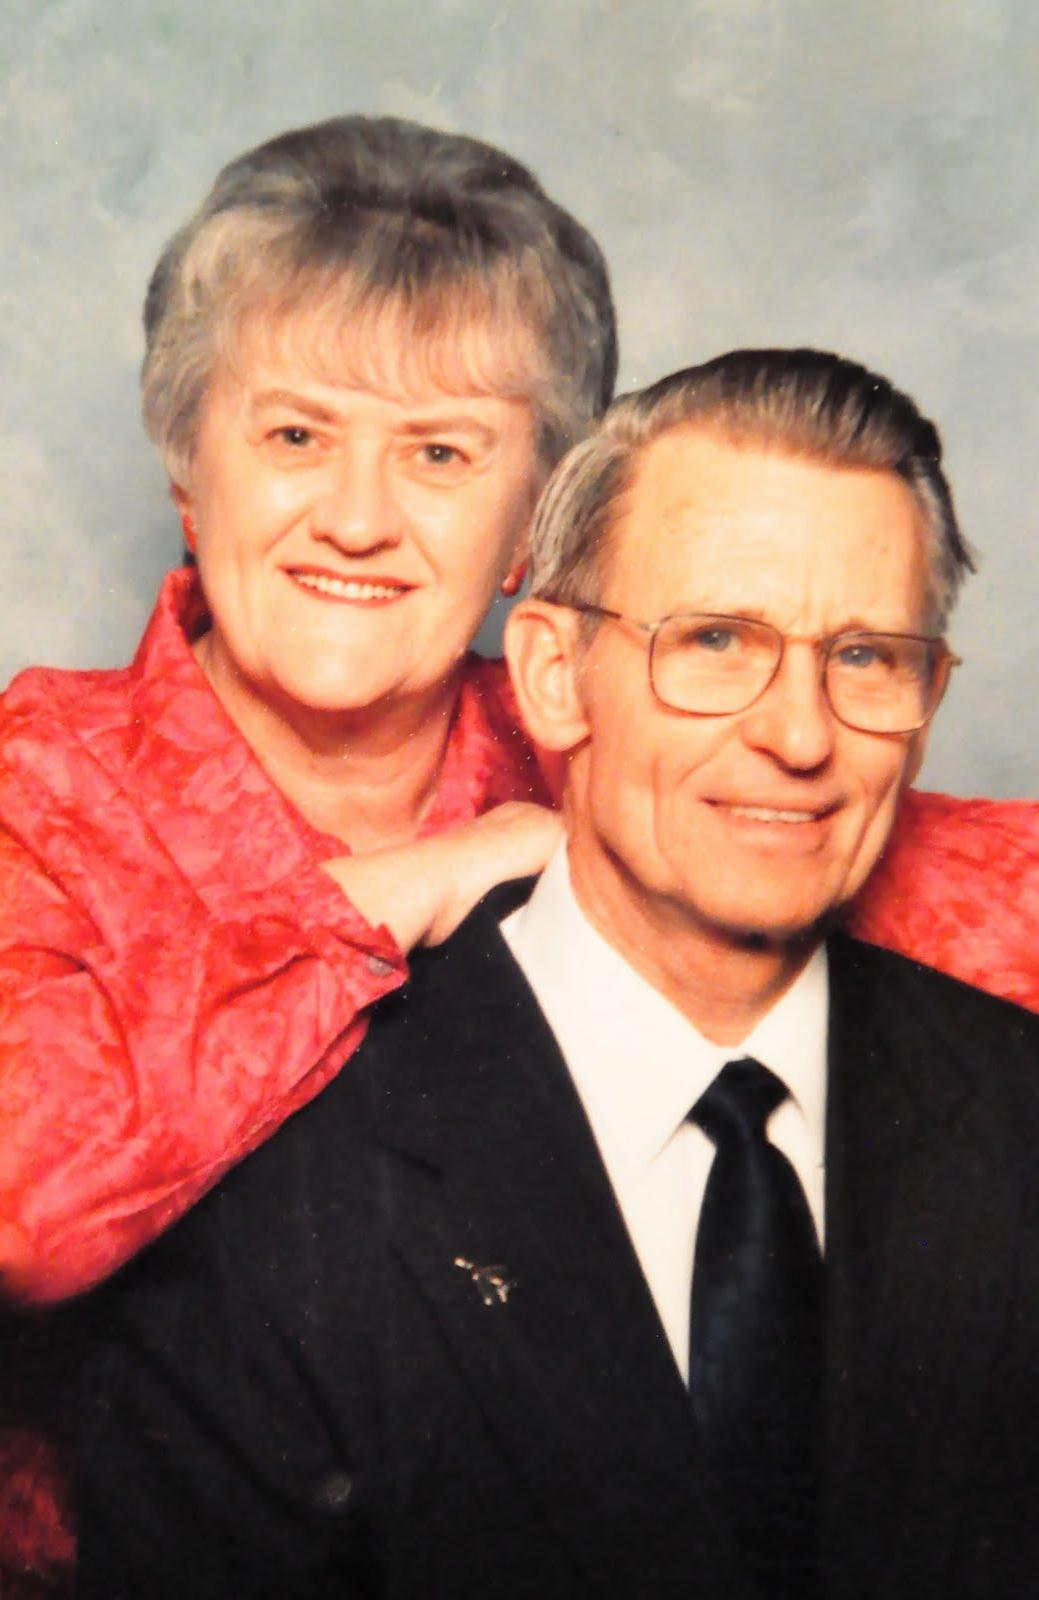 50th wedding anniversary.